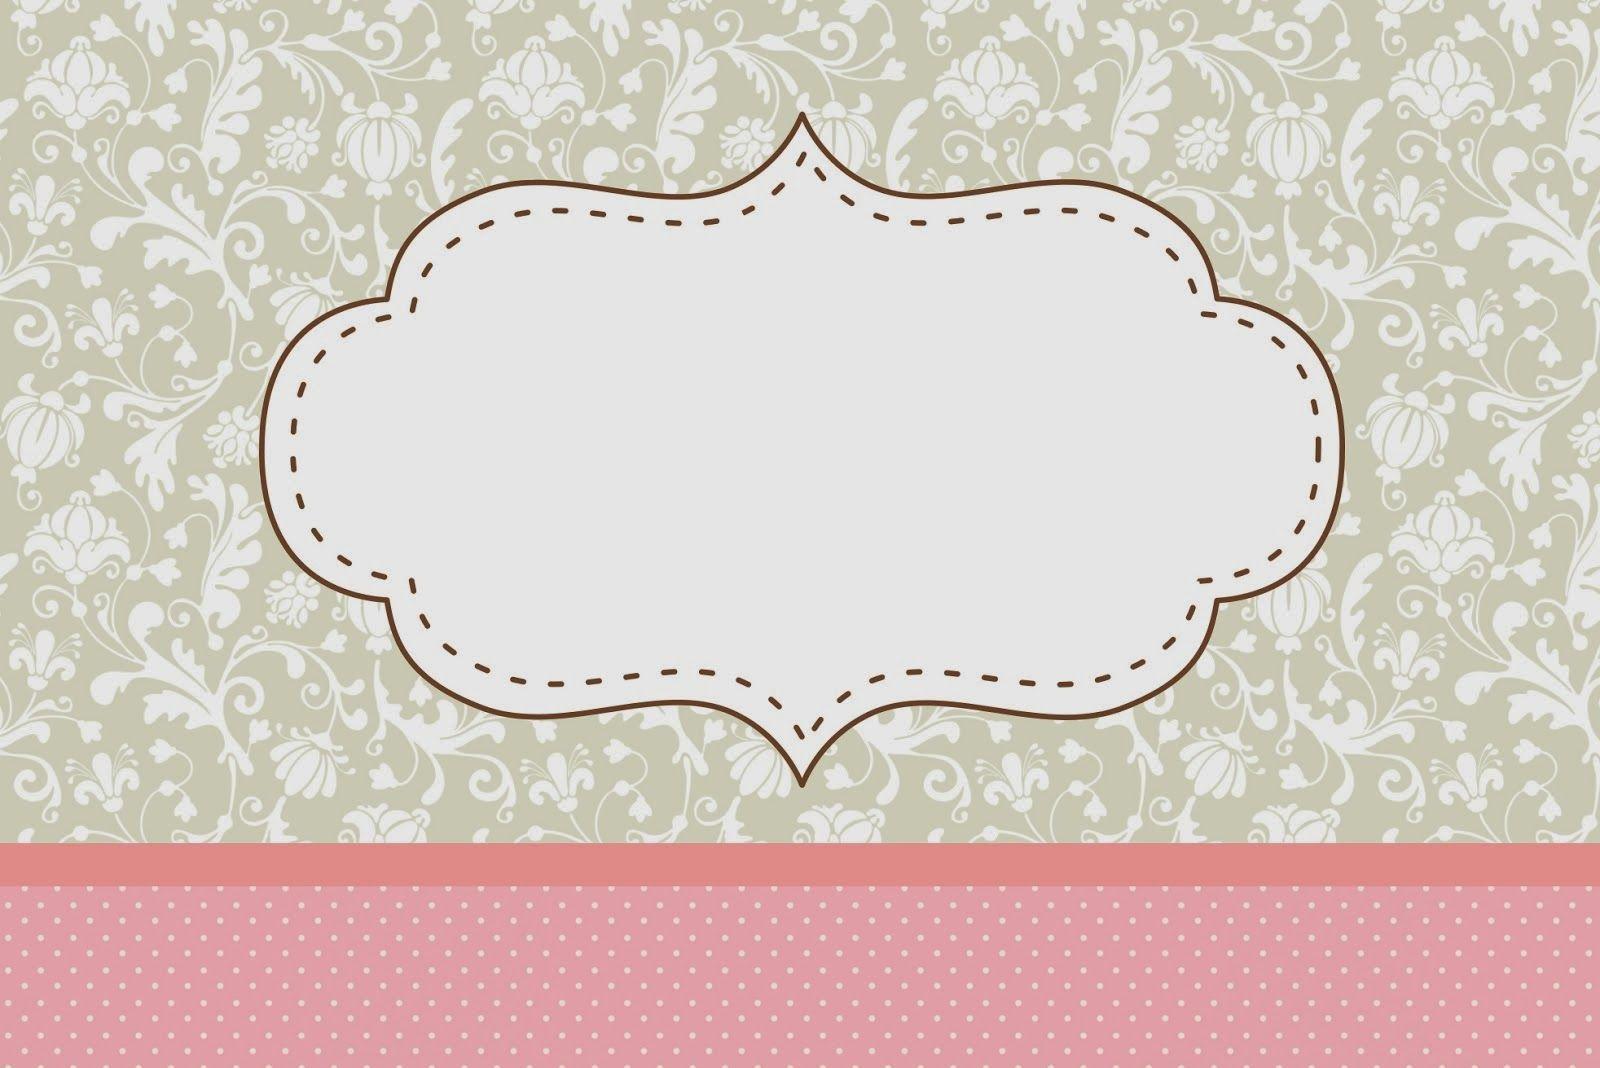 Minnie Mouse Invitations Ideas with beautiful invitations sample